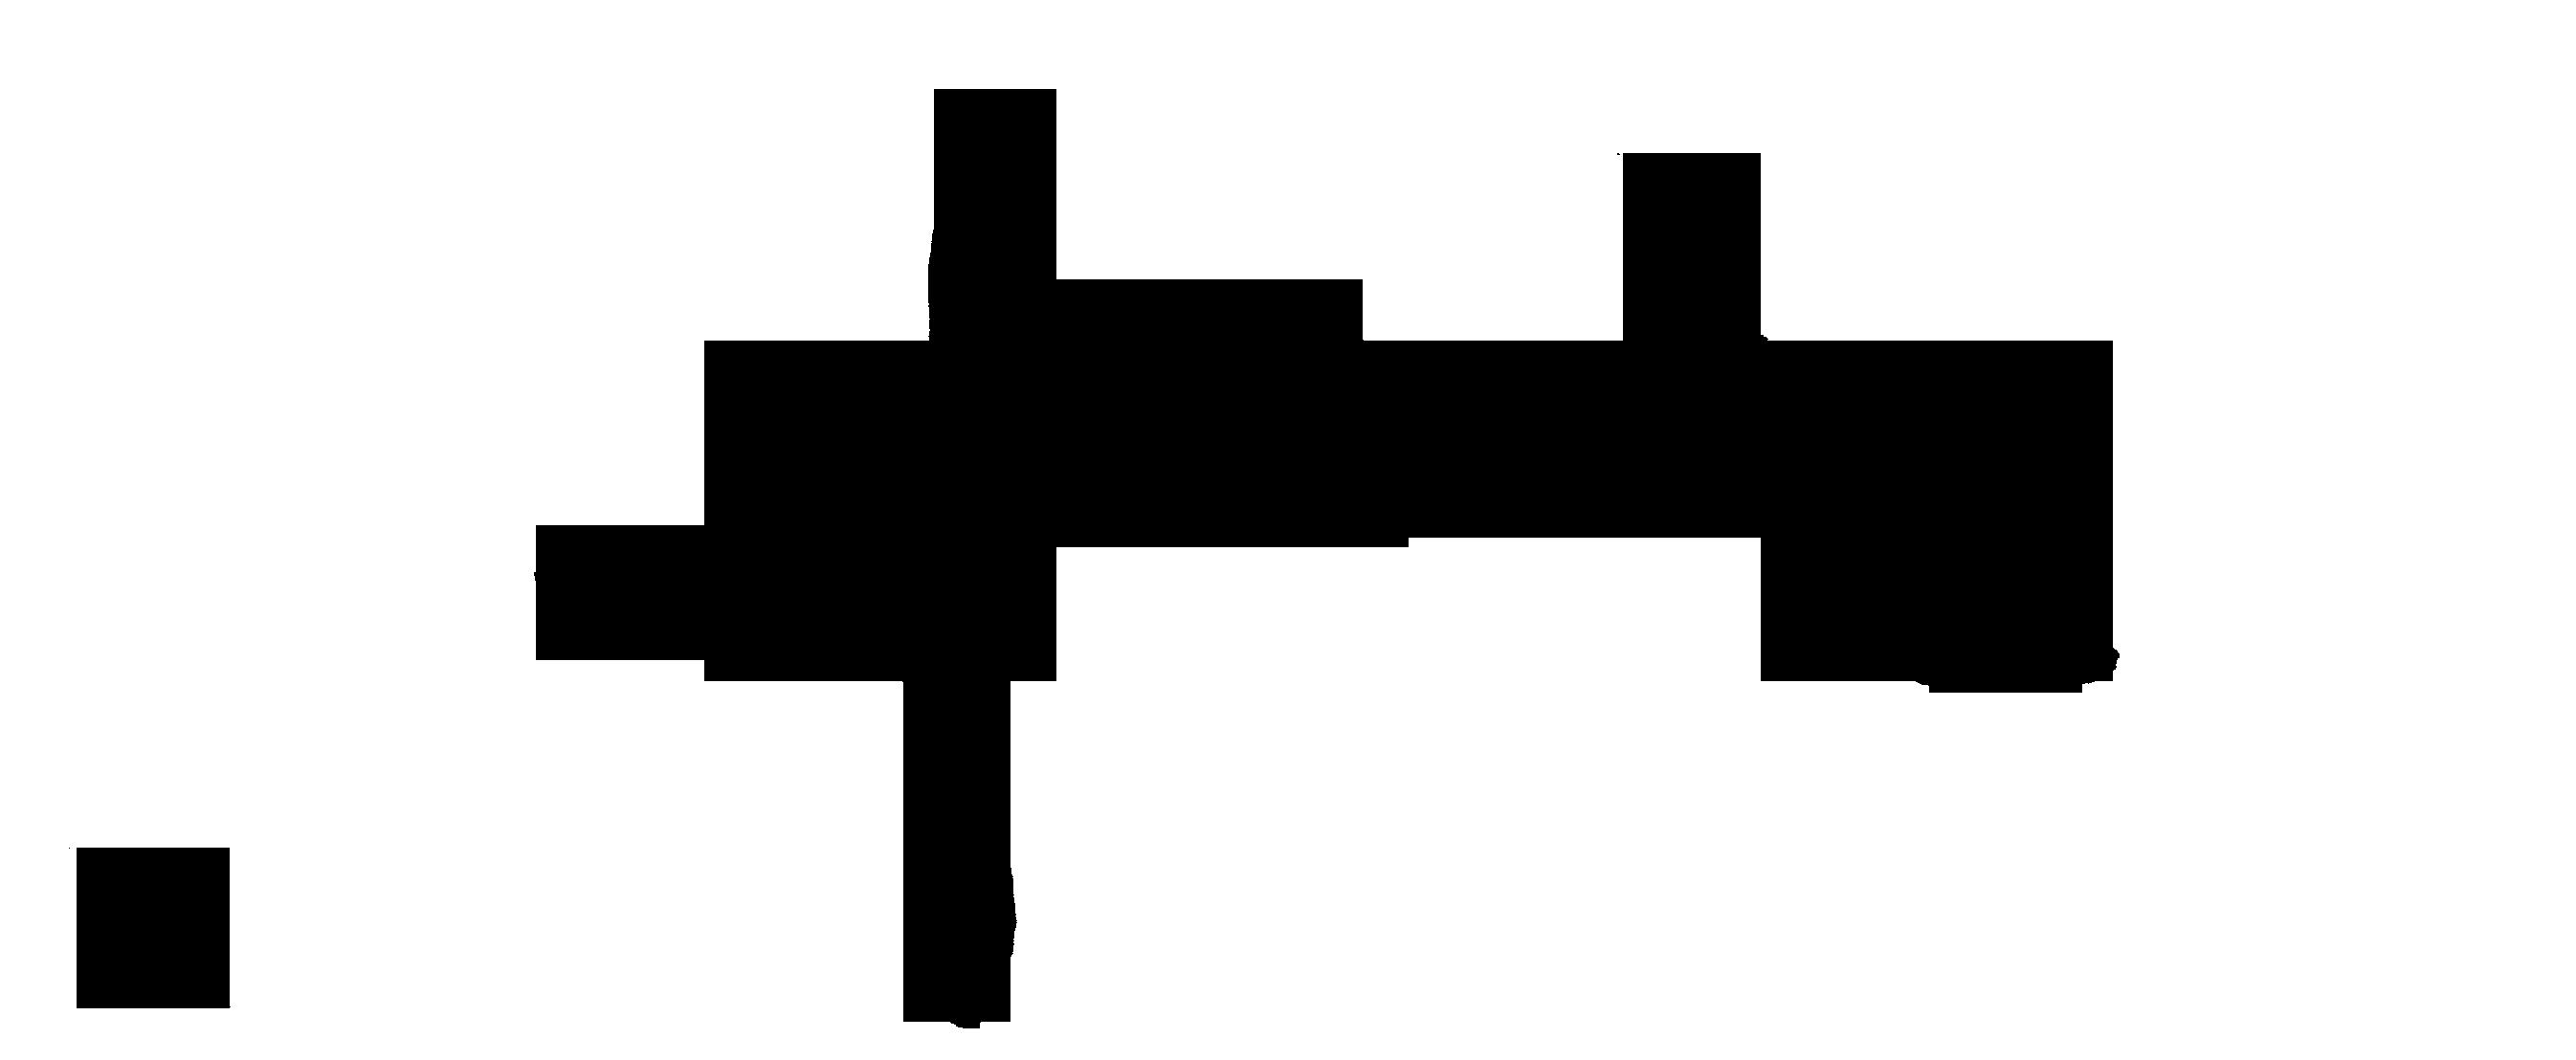 jeanne krabbendam's Signature